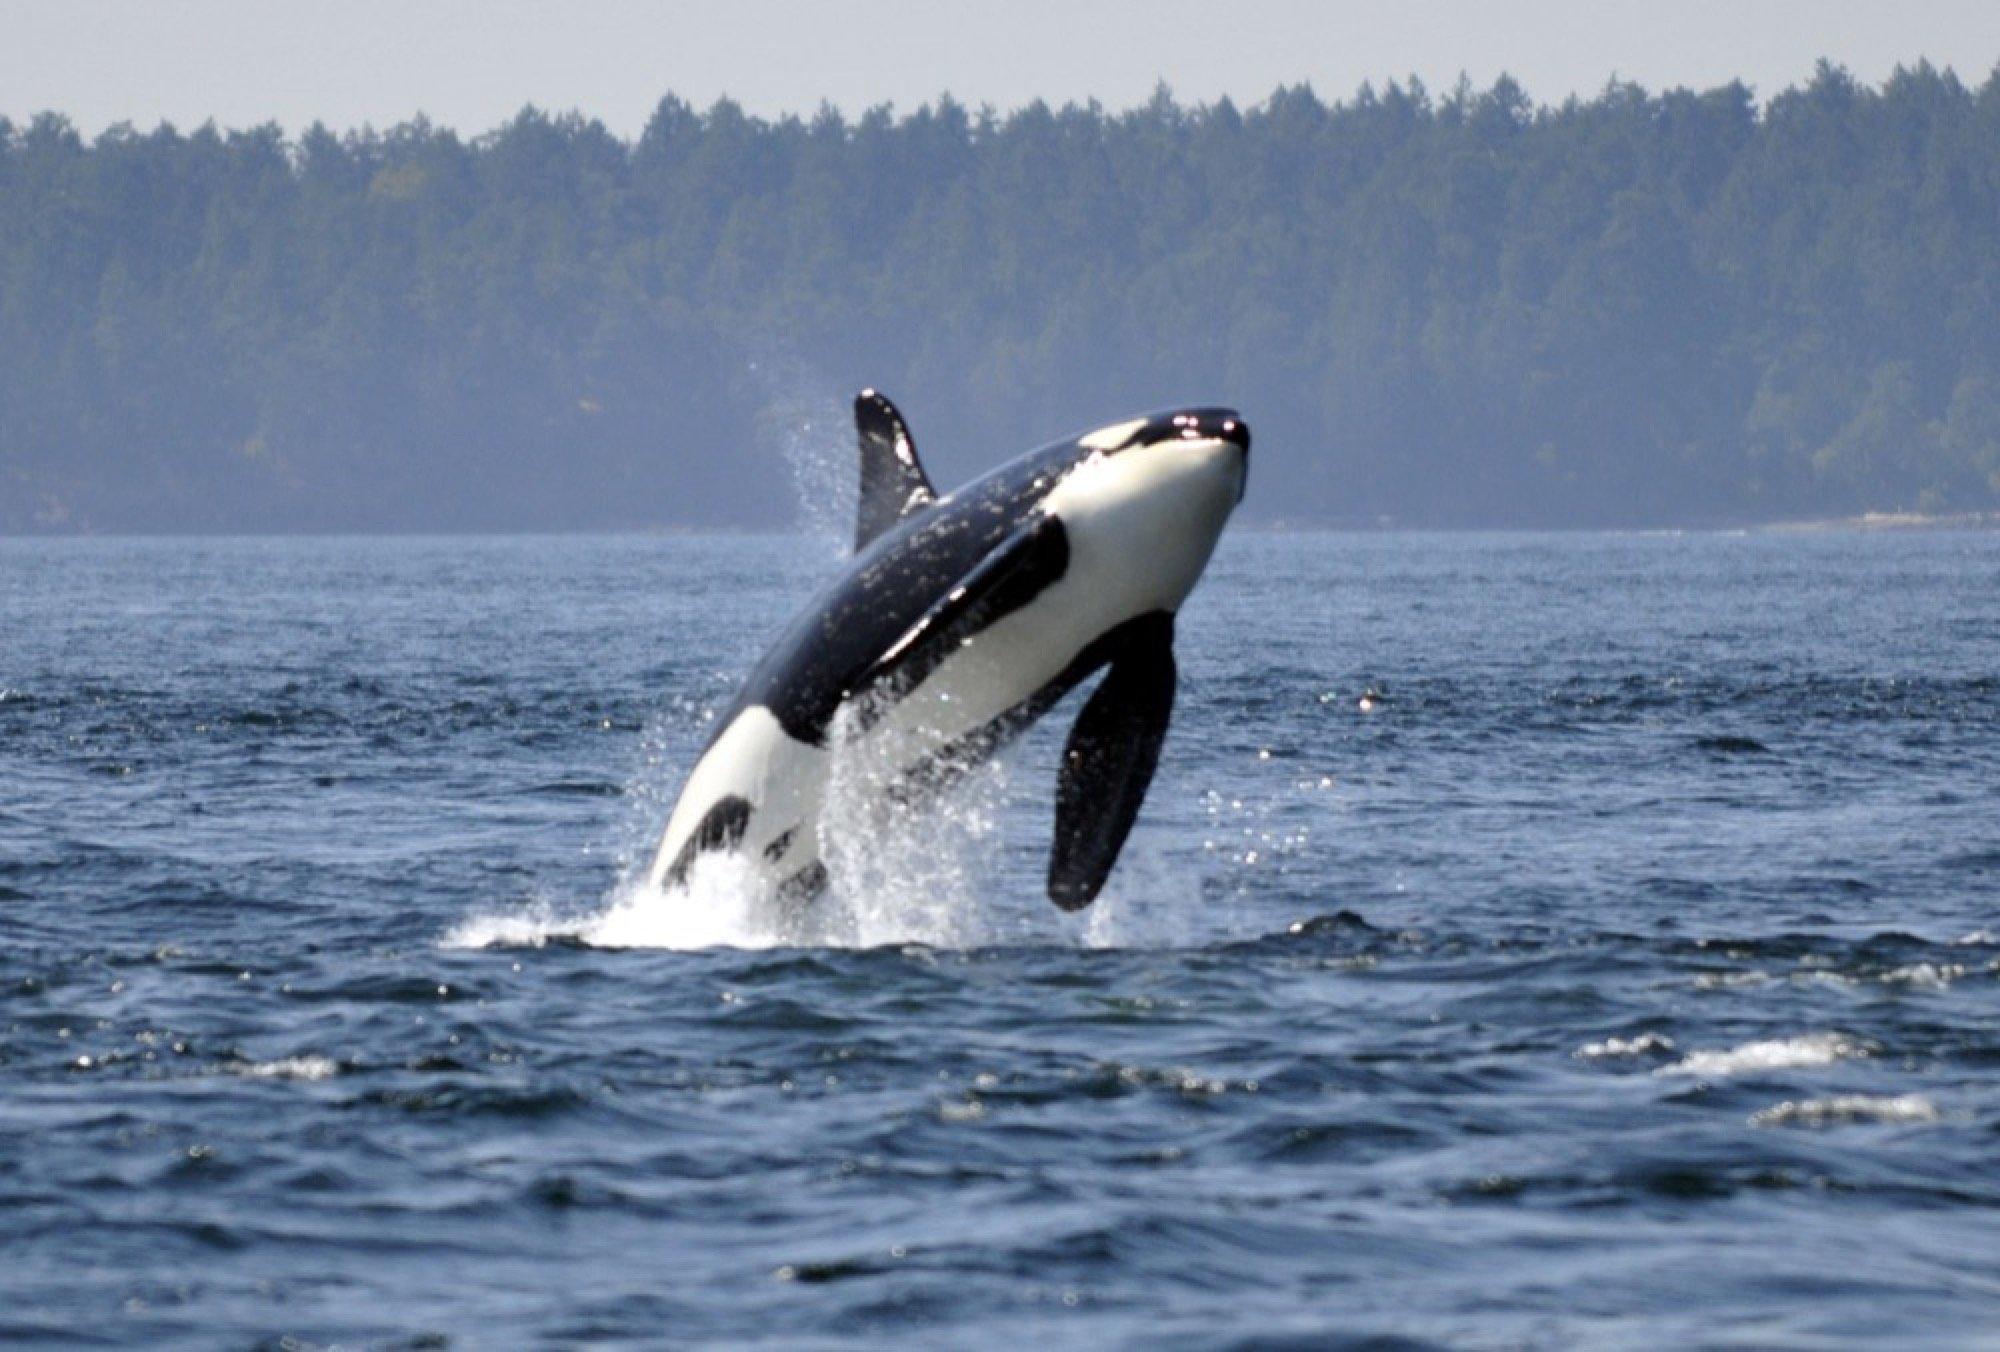 How a travel expert explores Juneau